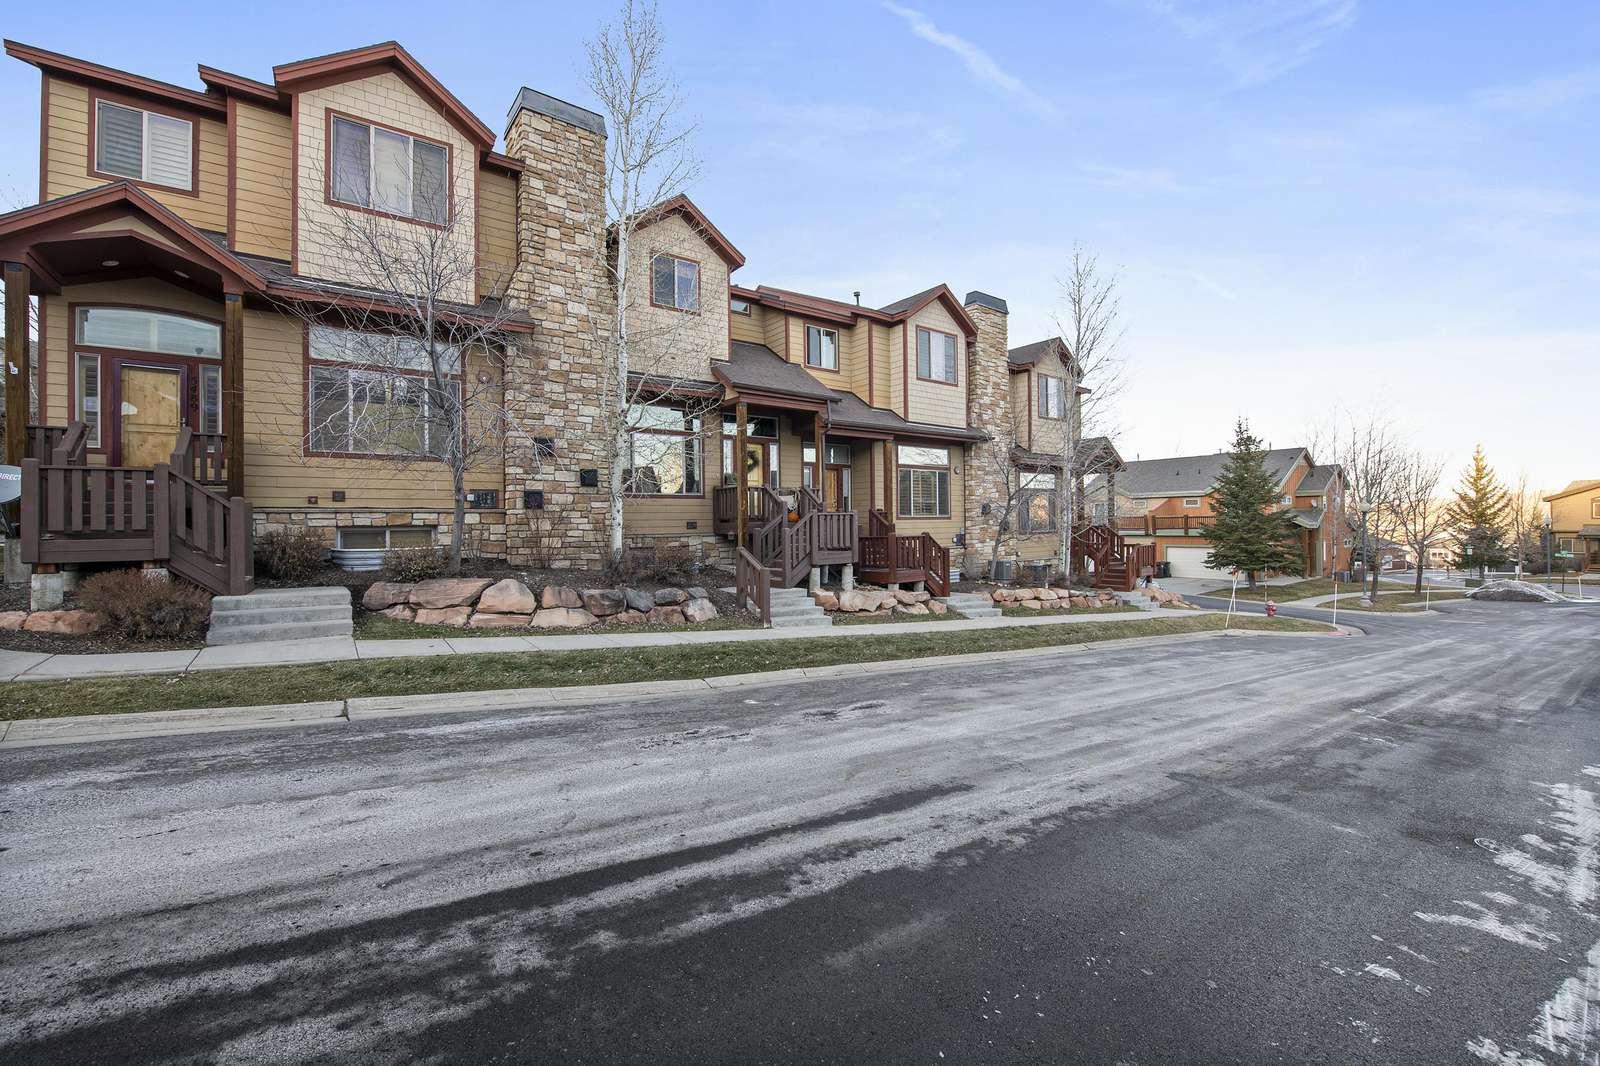 Property nestled in Bear Hollow Village